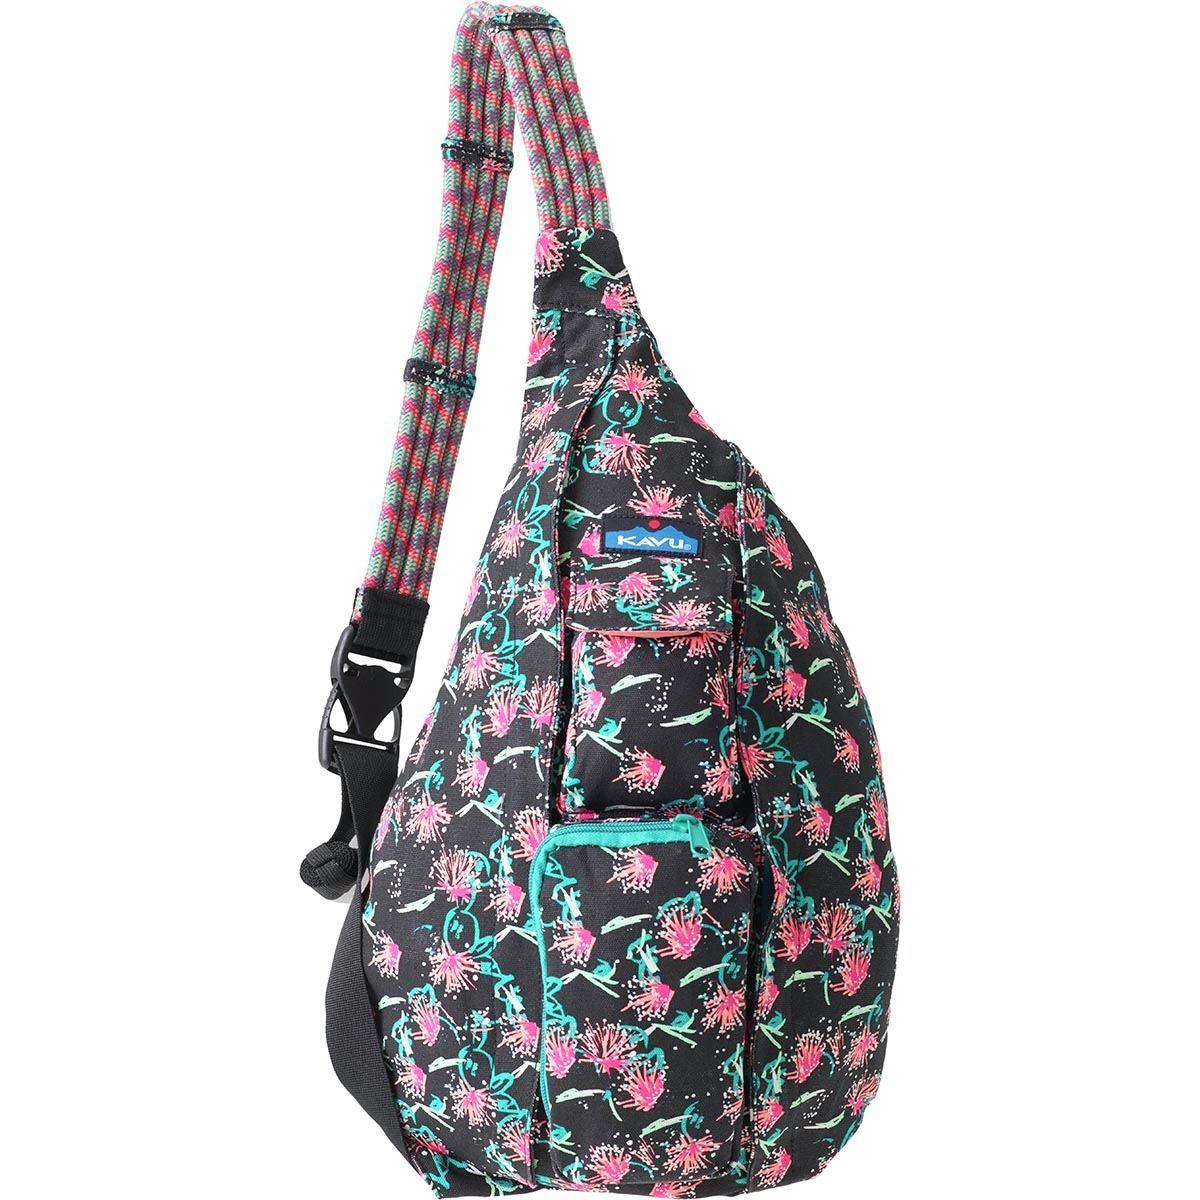 KAVU Rope Bag Purse - Women's Sparklers, One Size KAV0305-SPA-ONESIZ